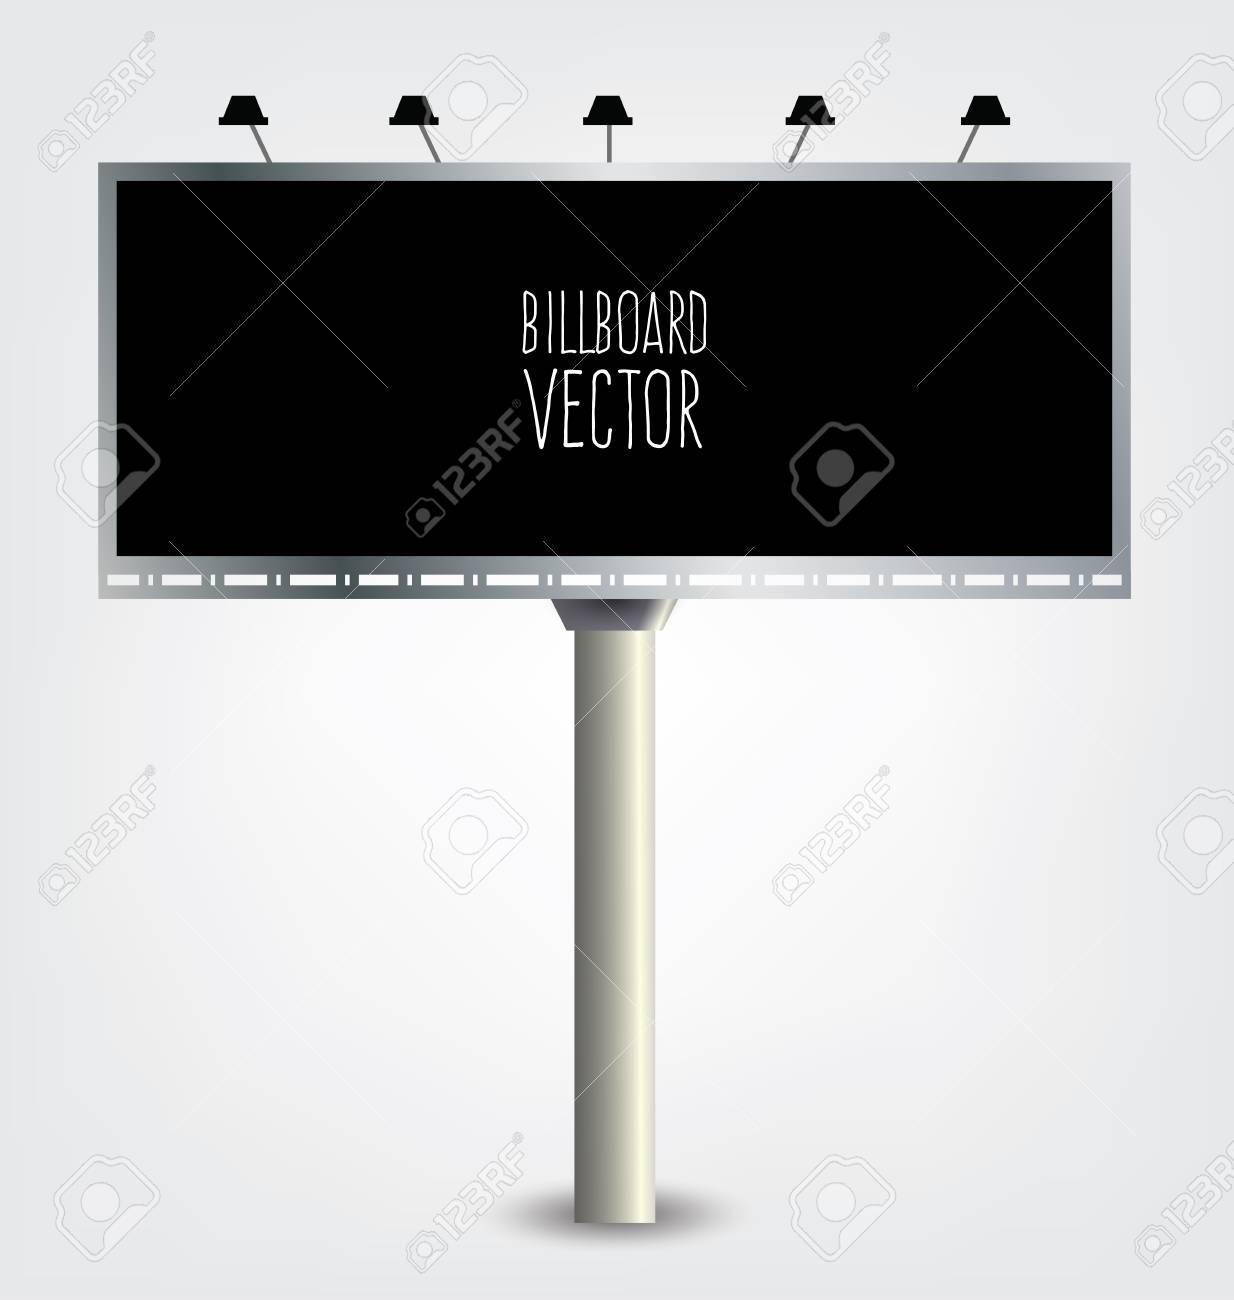 Billboard Template Outdoor Advertising Vector Illustration Royalty